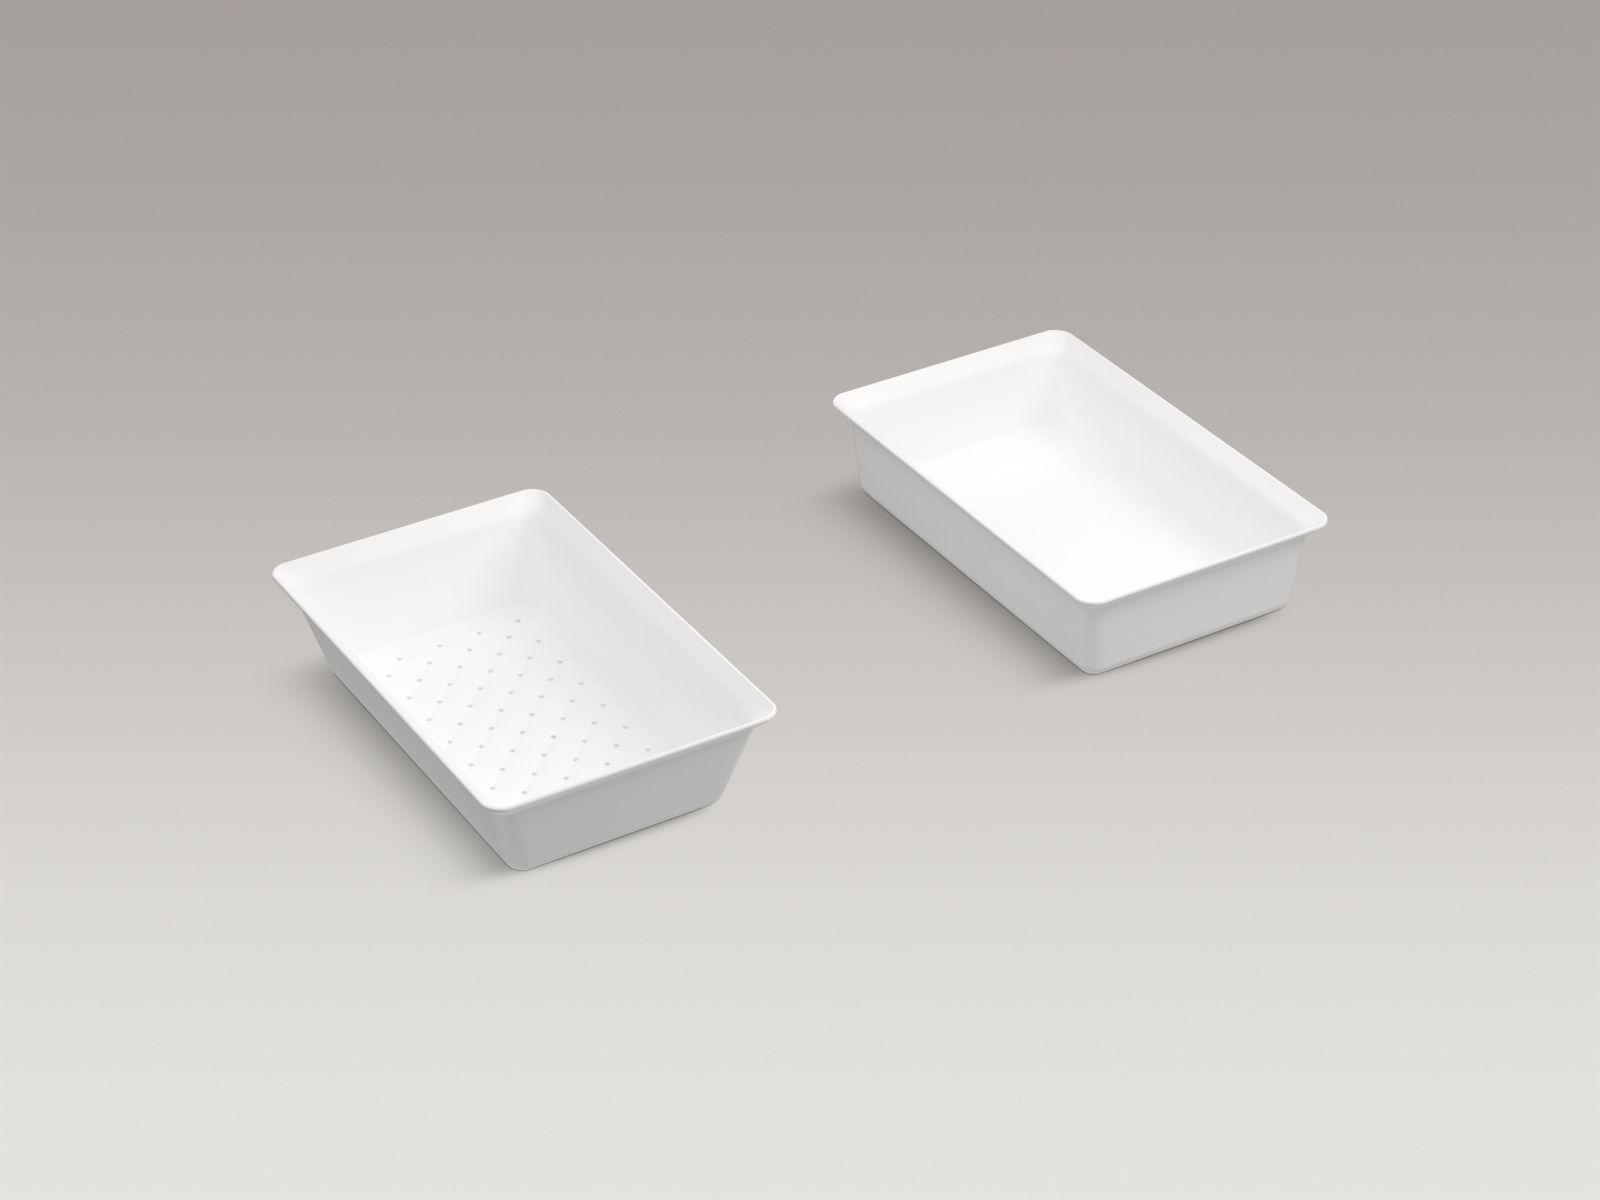 Kohler Prolific™ K-5544-0 colander and washbin White